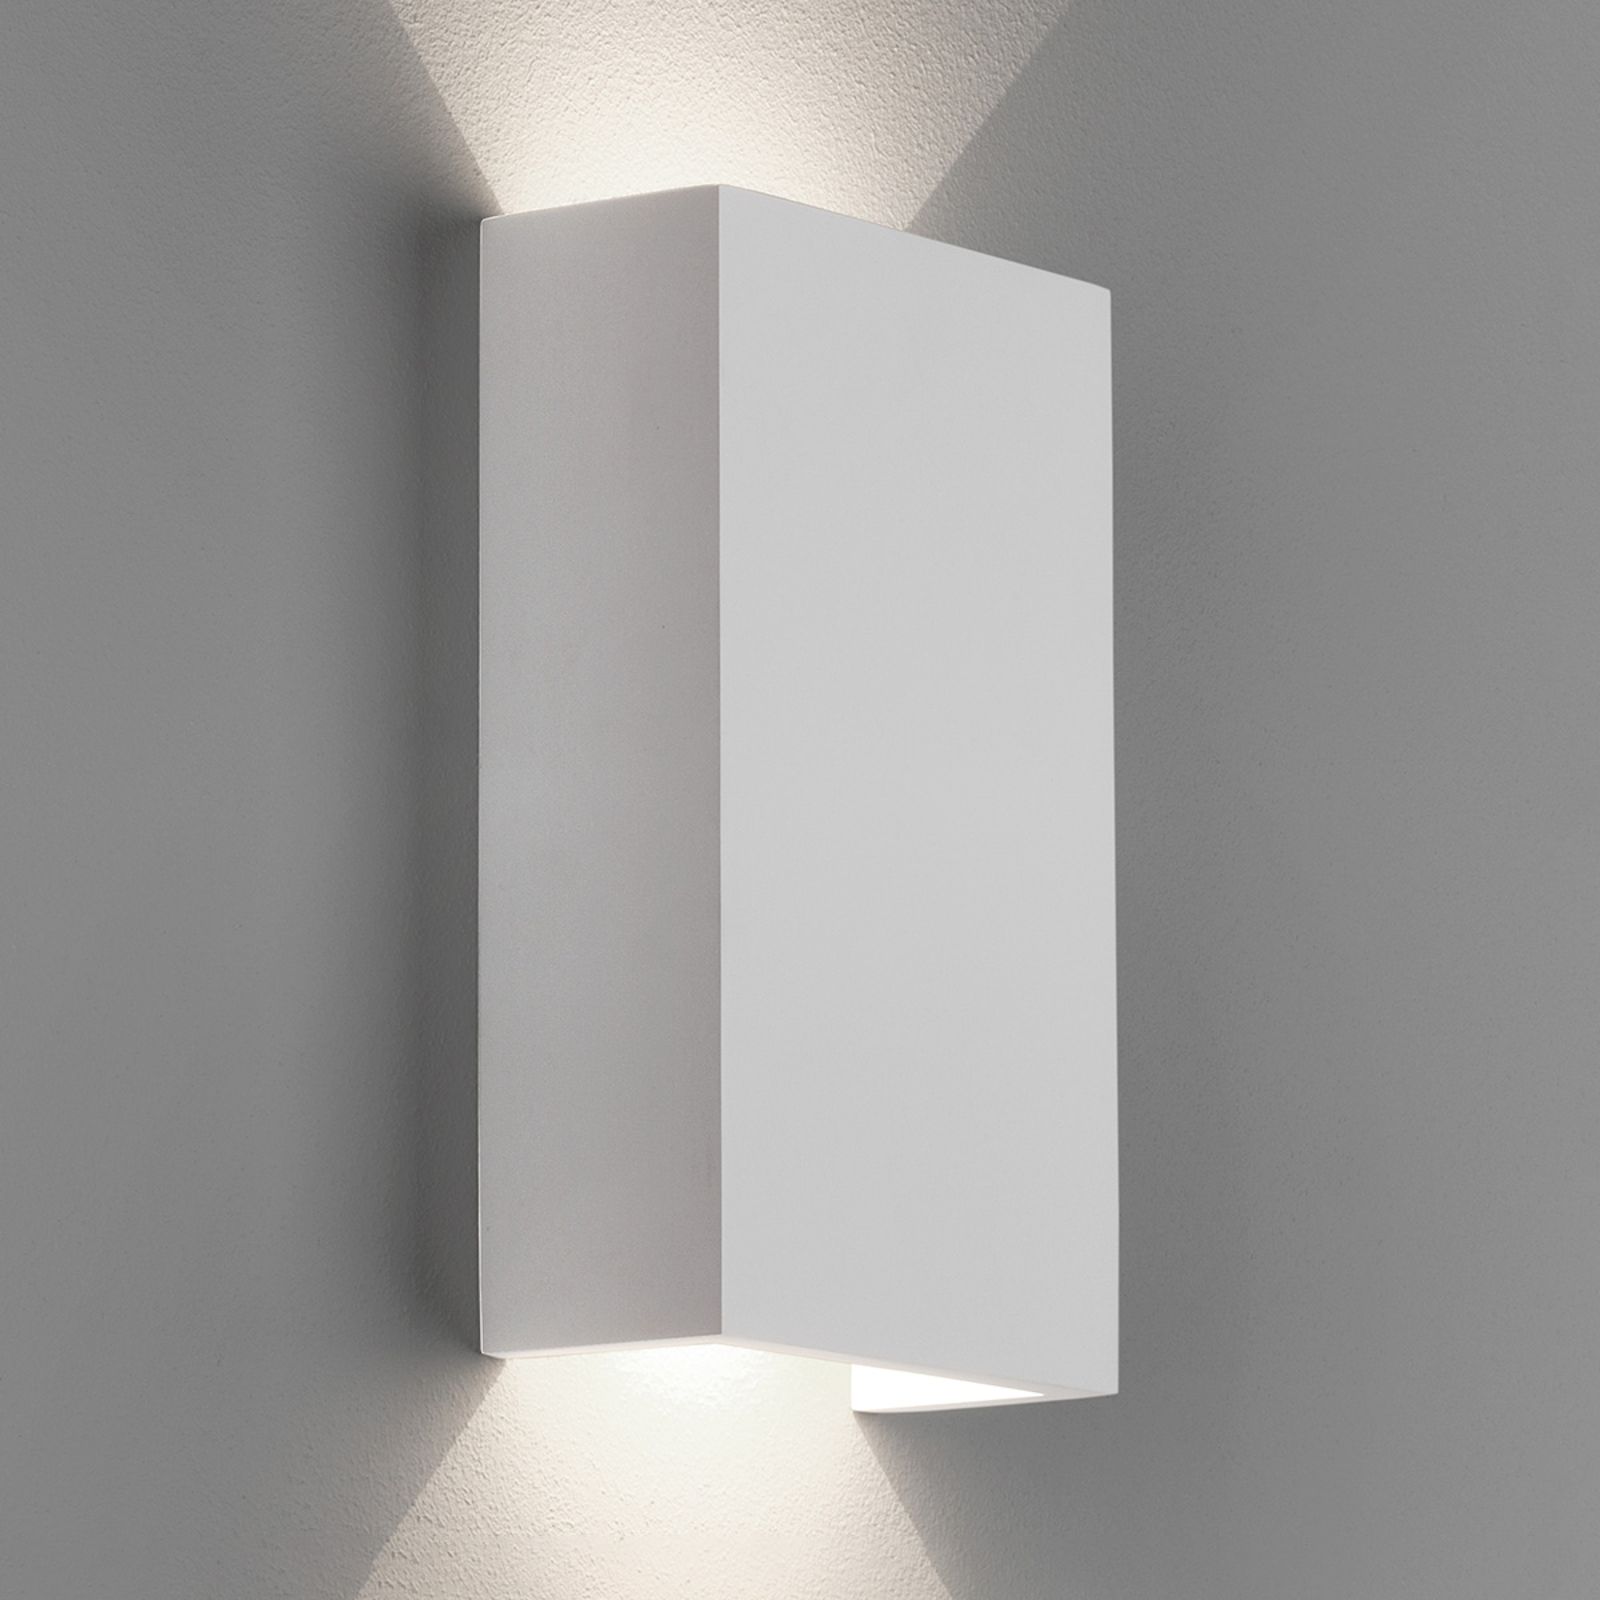 Astro Rio 125 LED-Gips-Wandlampe, 2.700 K